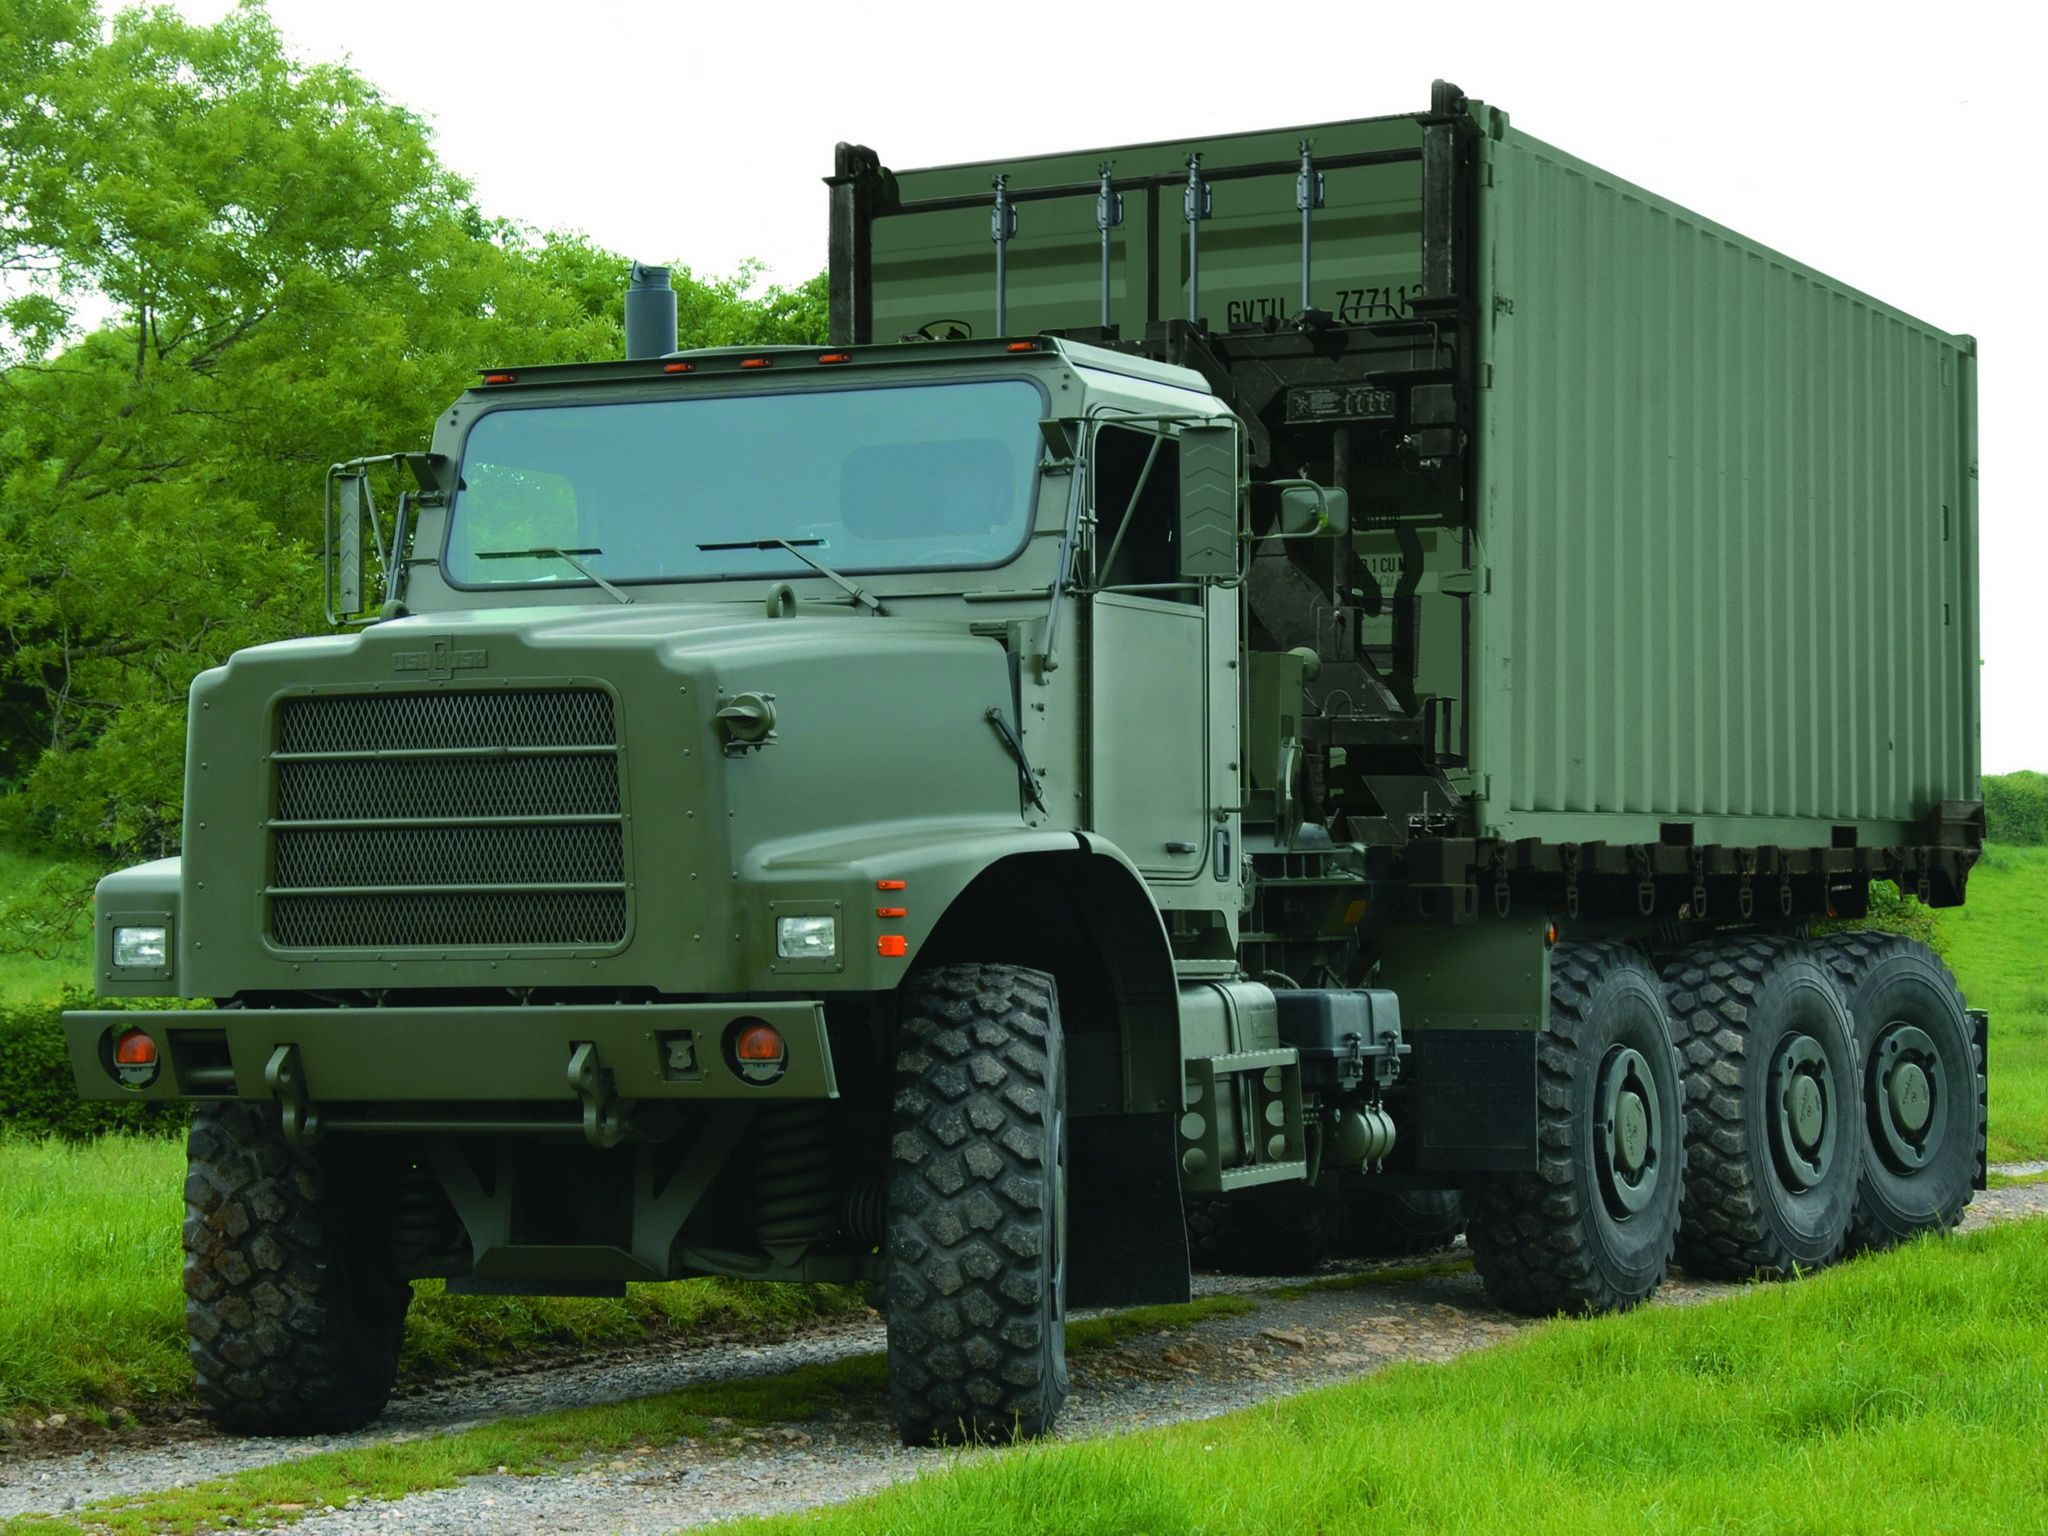 oshkosh mtvr 16 5 ton 8x8 lhs 39 2005 army pinterest terrestre g n ration et vehicule. Black Bedroom Furniture Sets. Home Design Ideas